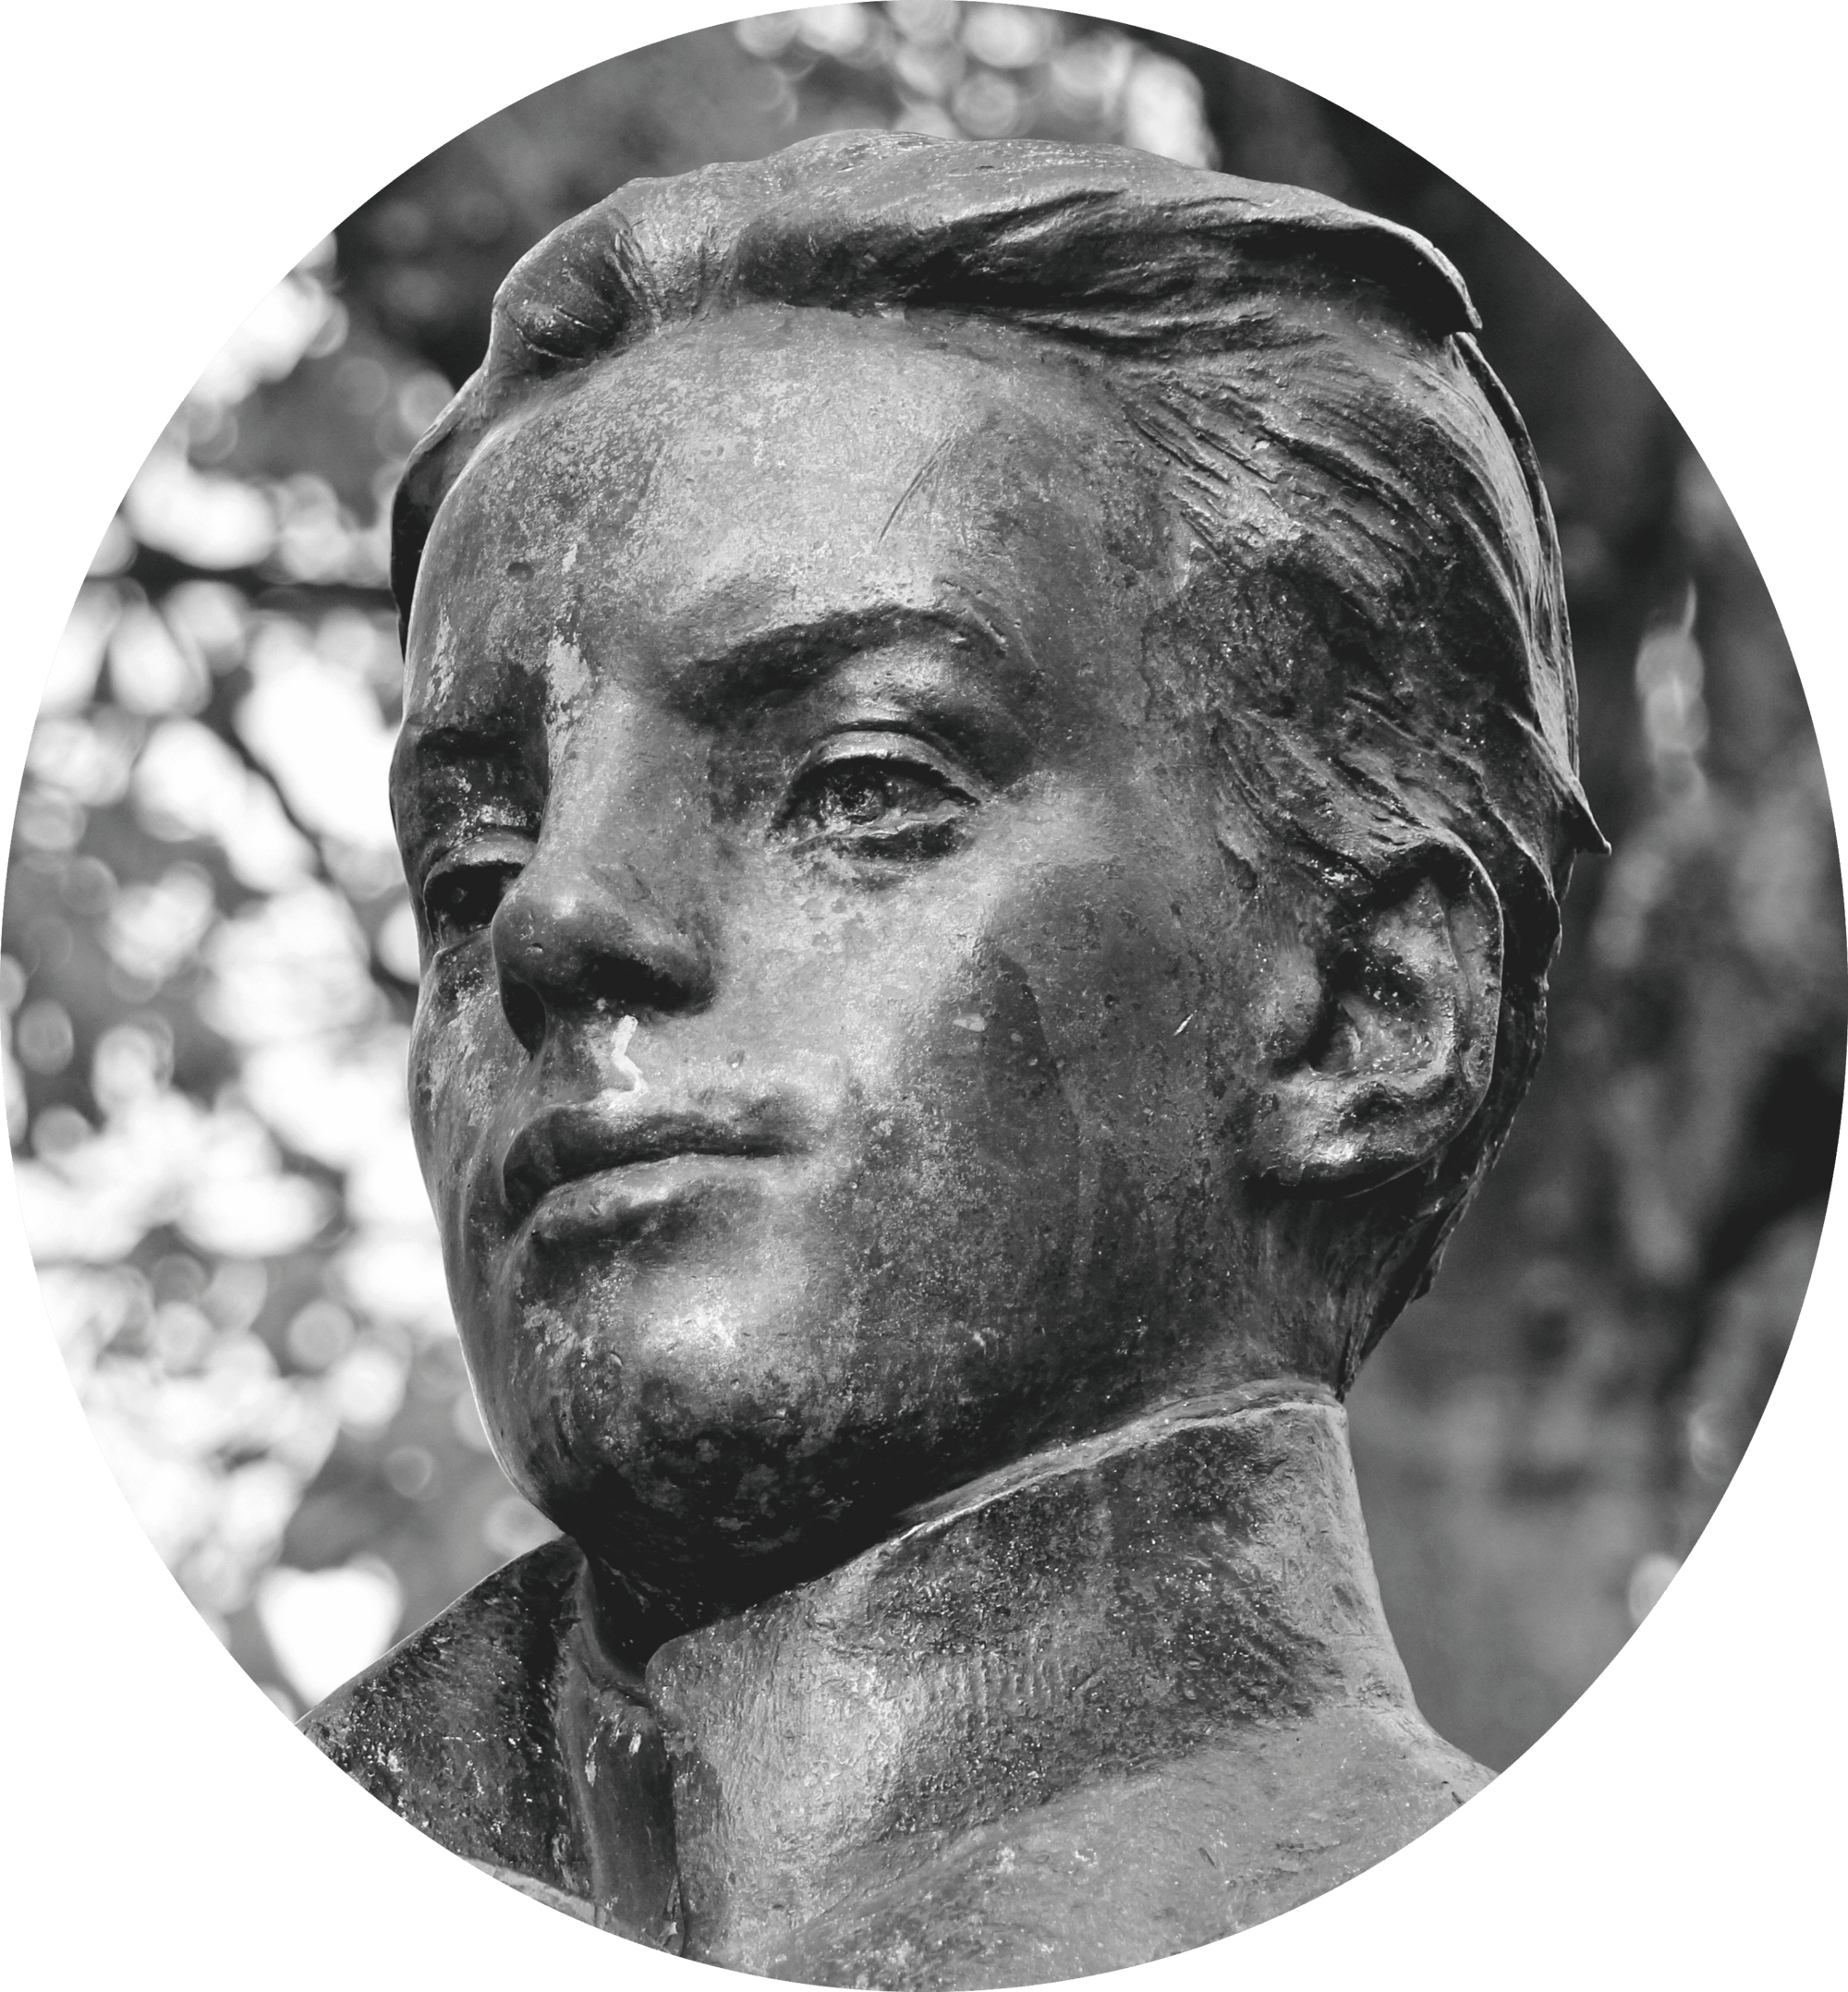 Léon Trulin